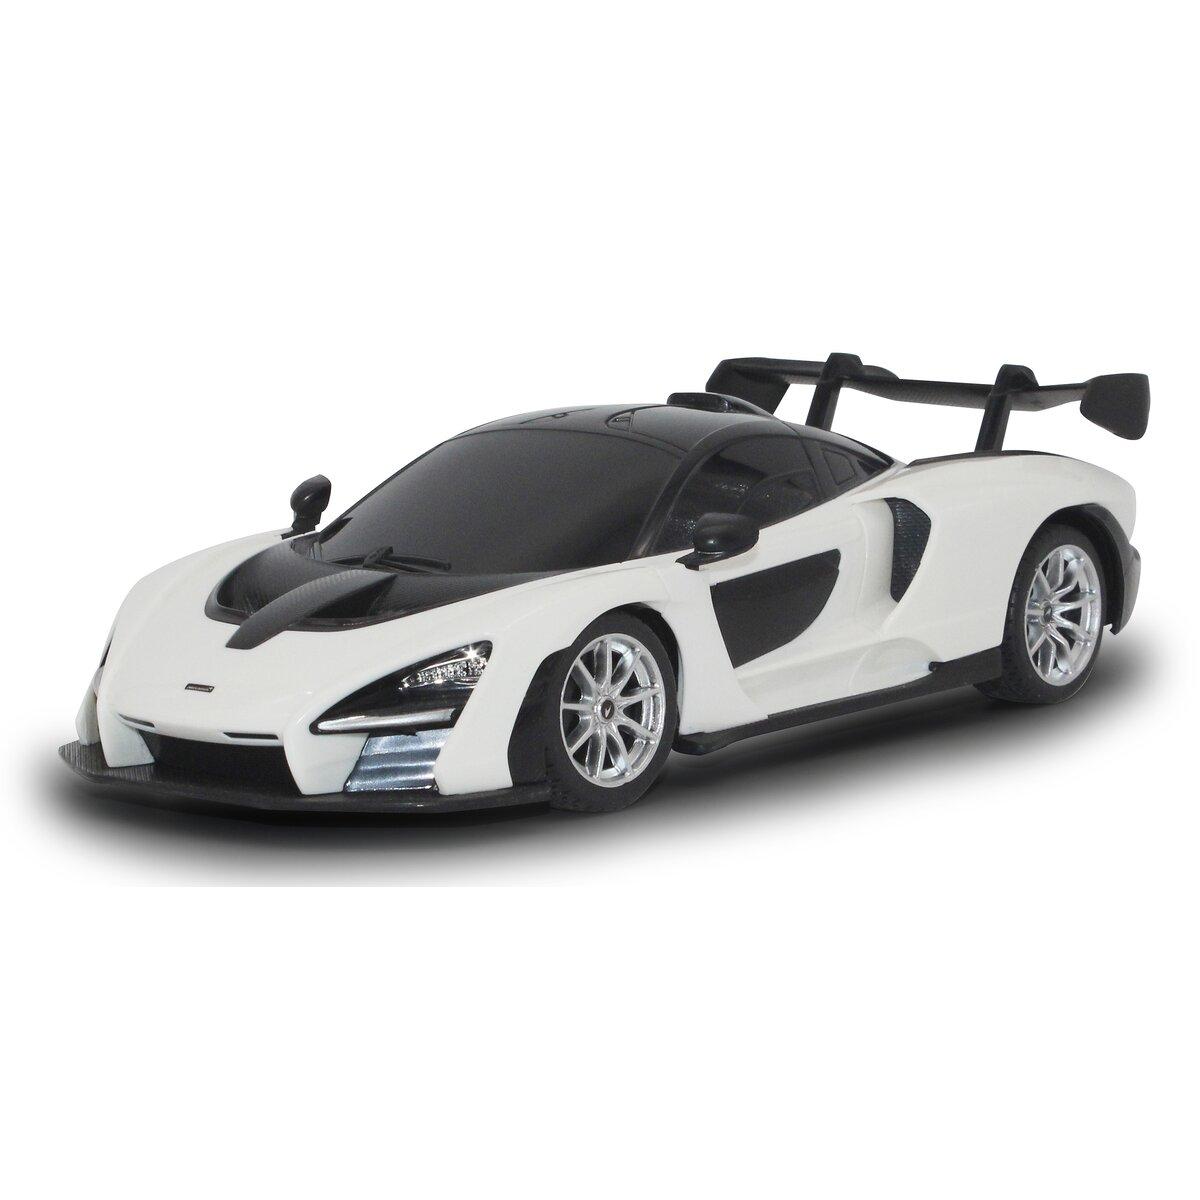 Jamara McLaren Senna 1:24 white 2,4GHz